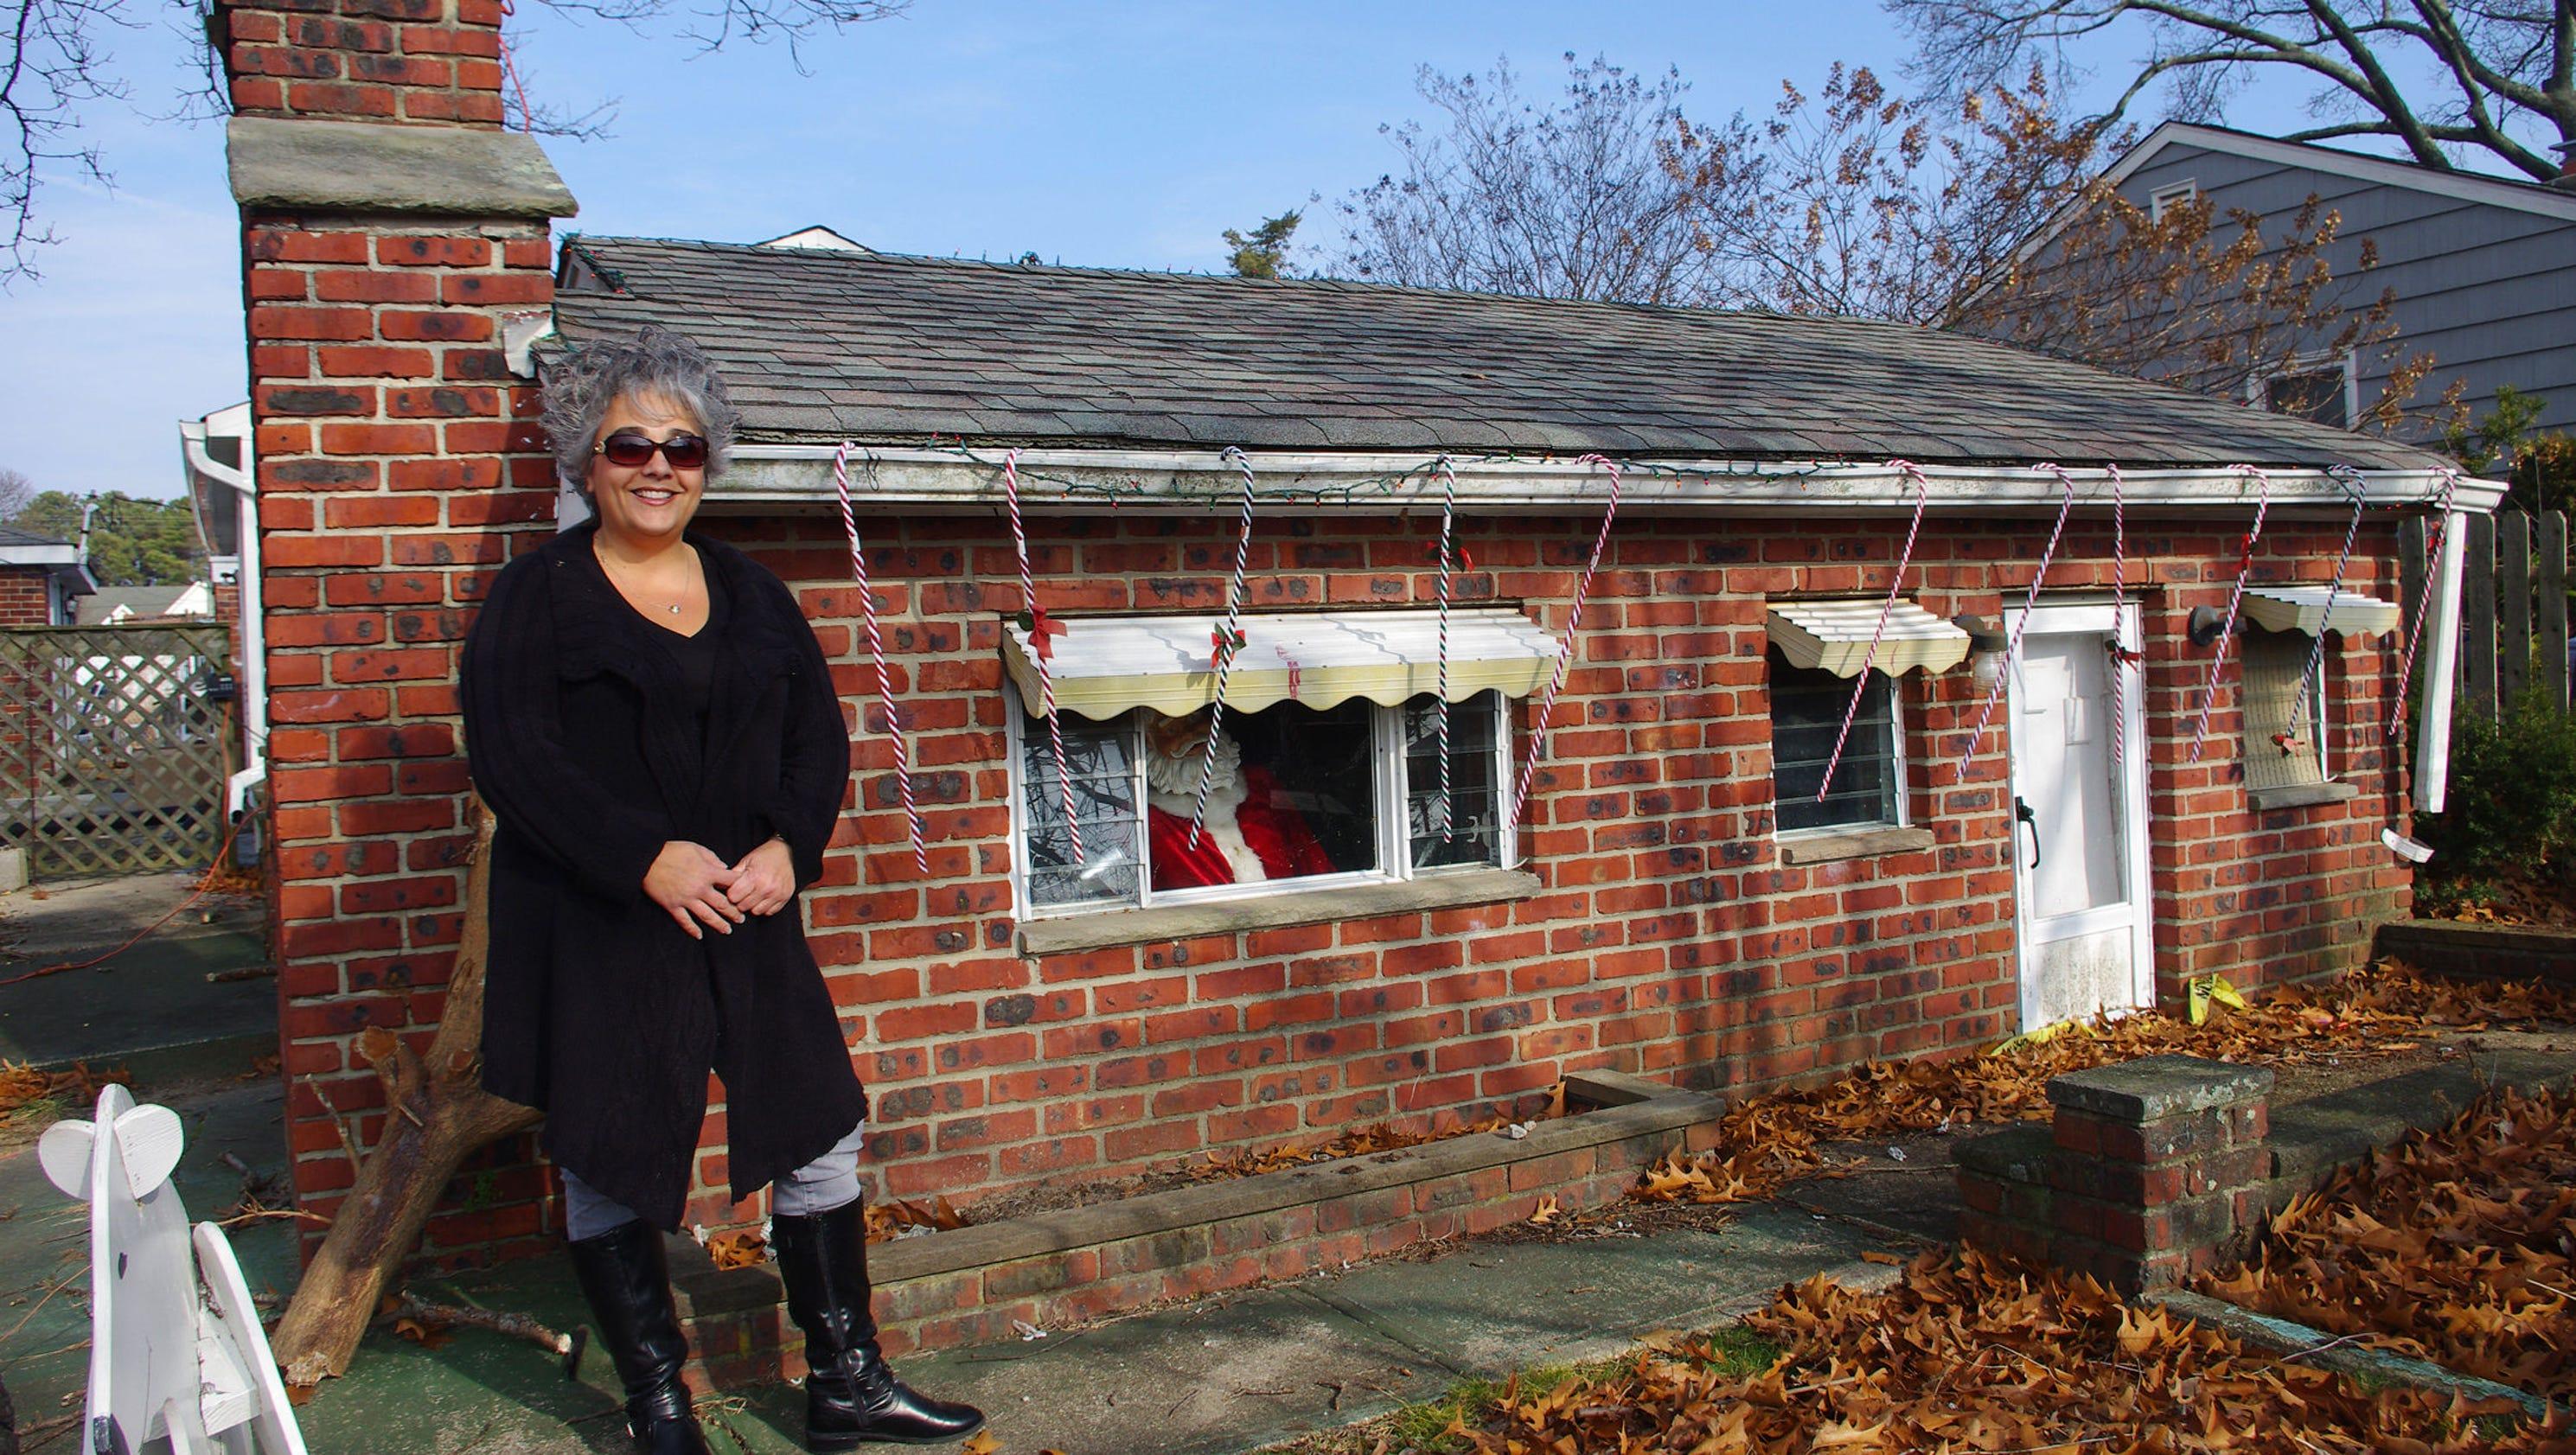 Weird NJ: The Midget House of Brick